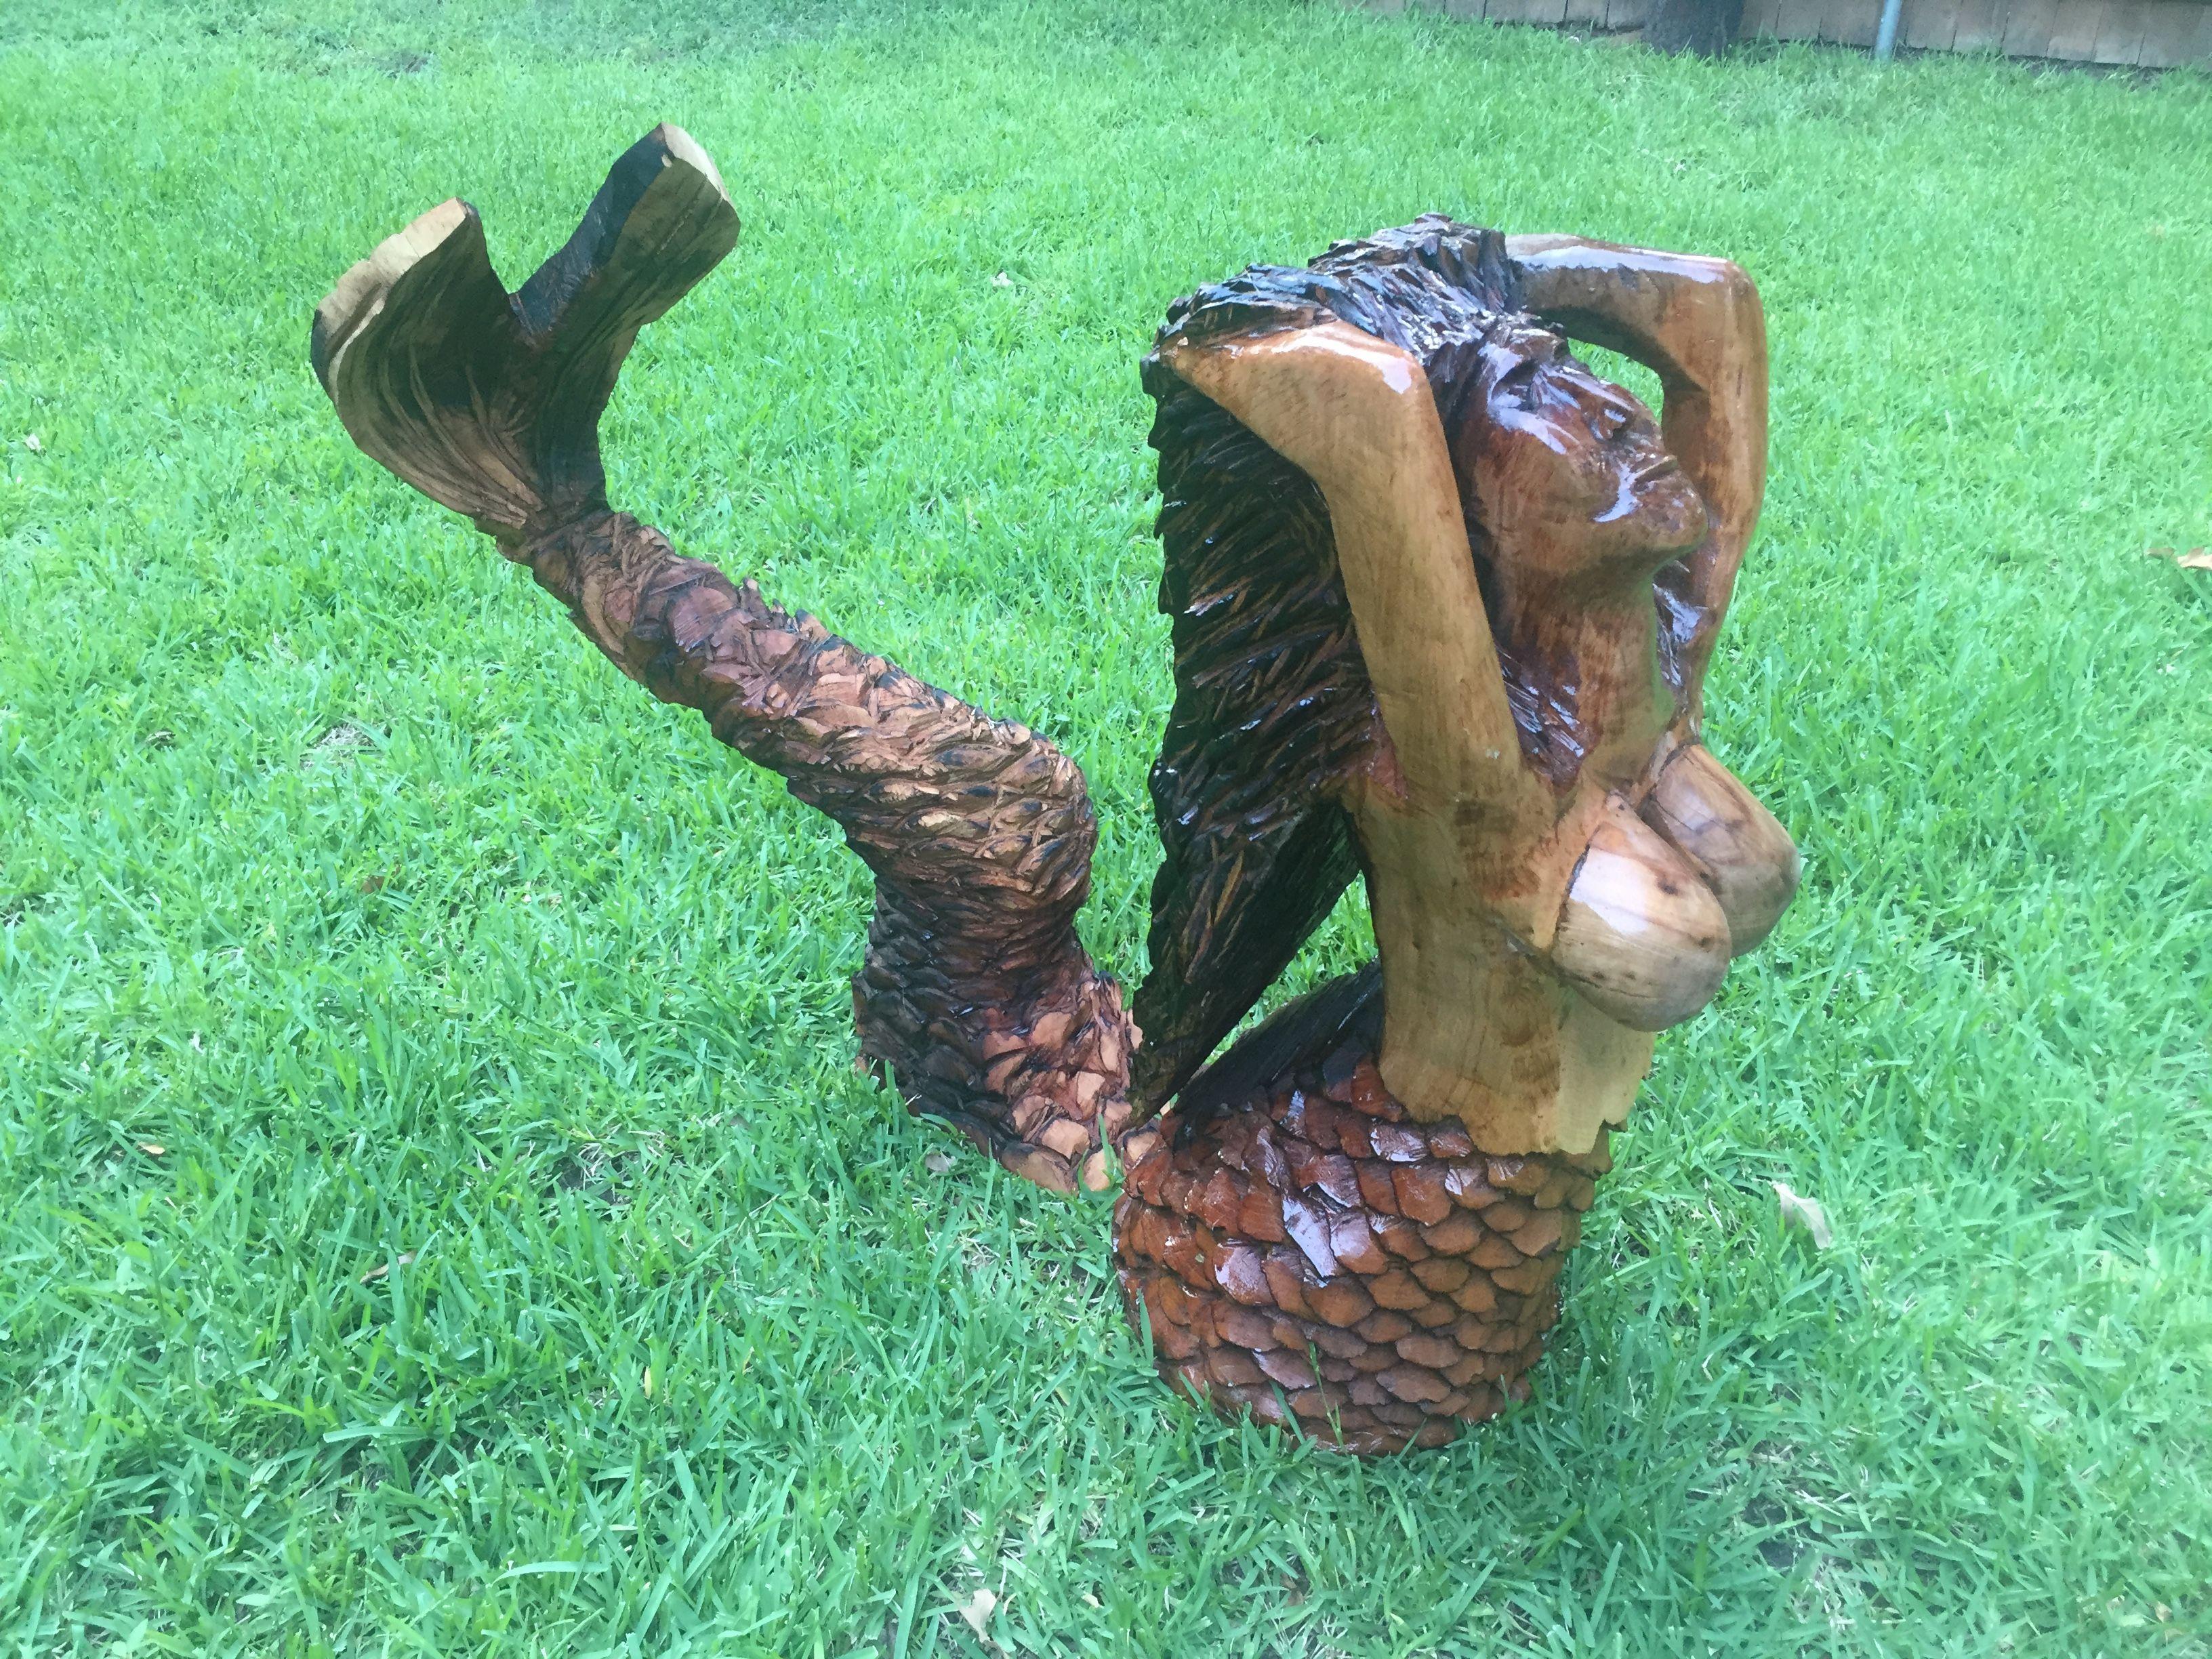 Texas chainsaw mermaid chainsaw artist rob banda